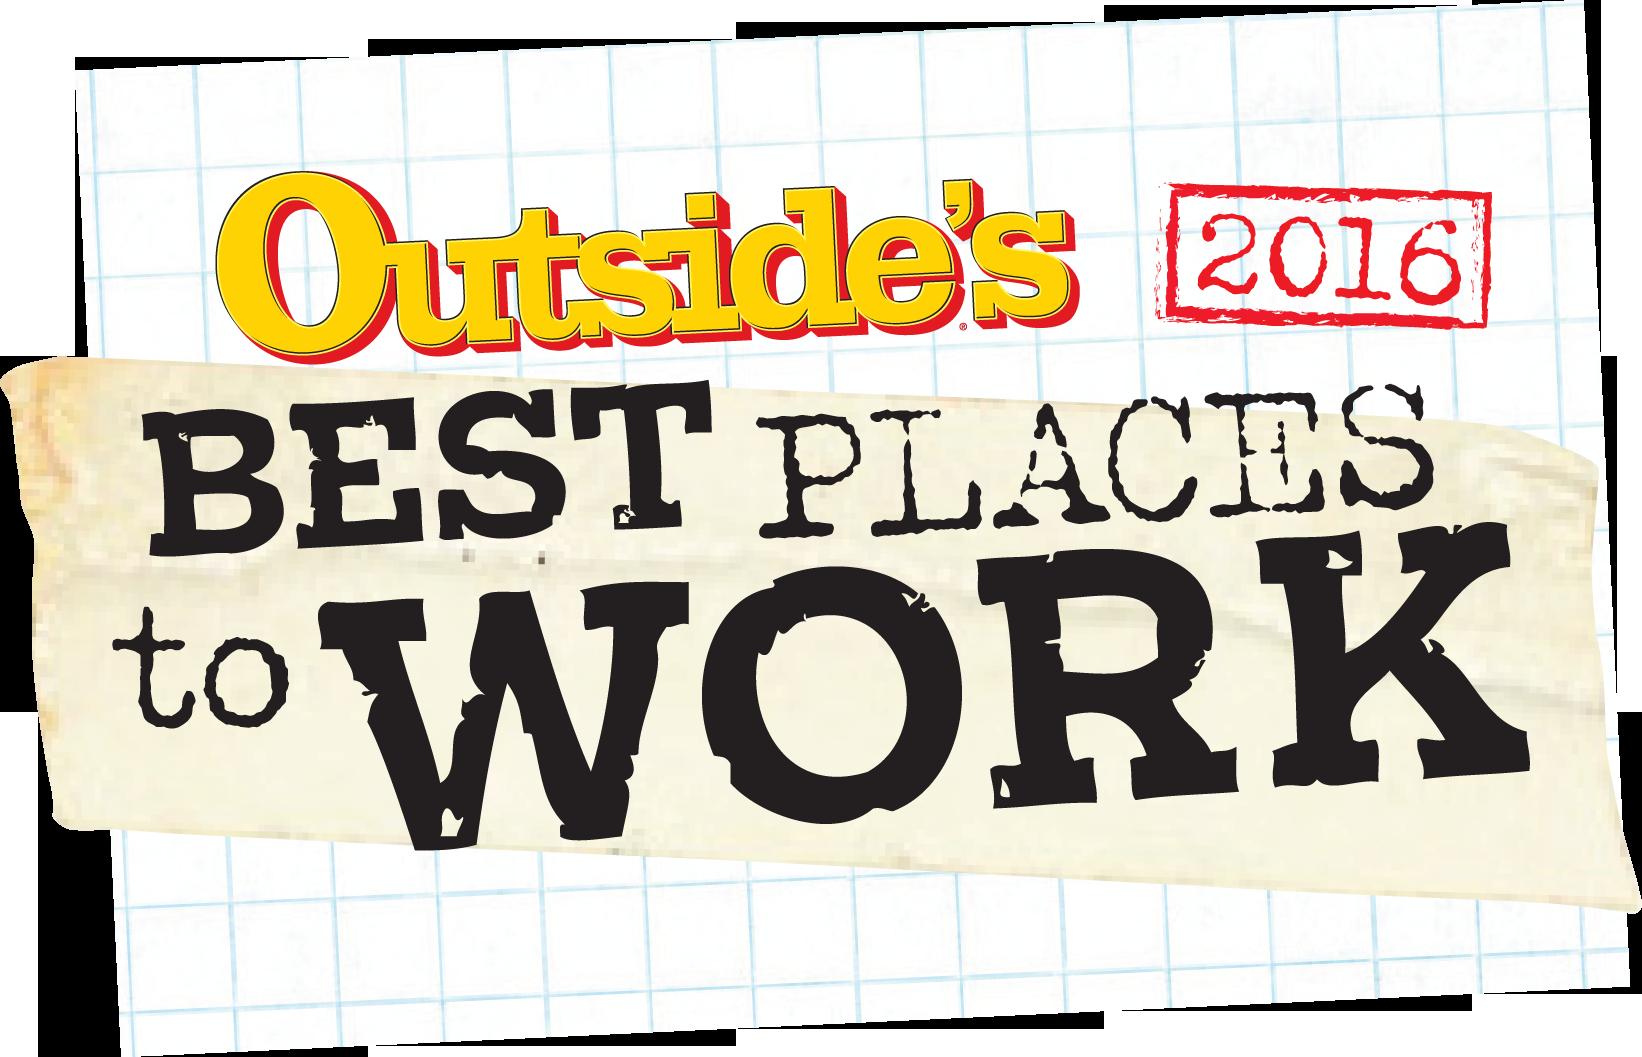 bestplacestowork_logo_2016